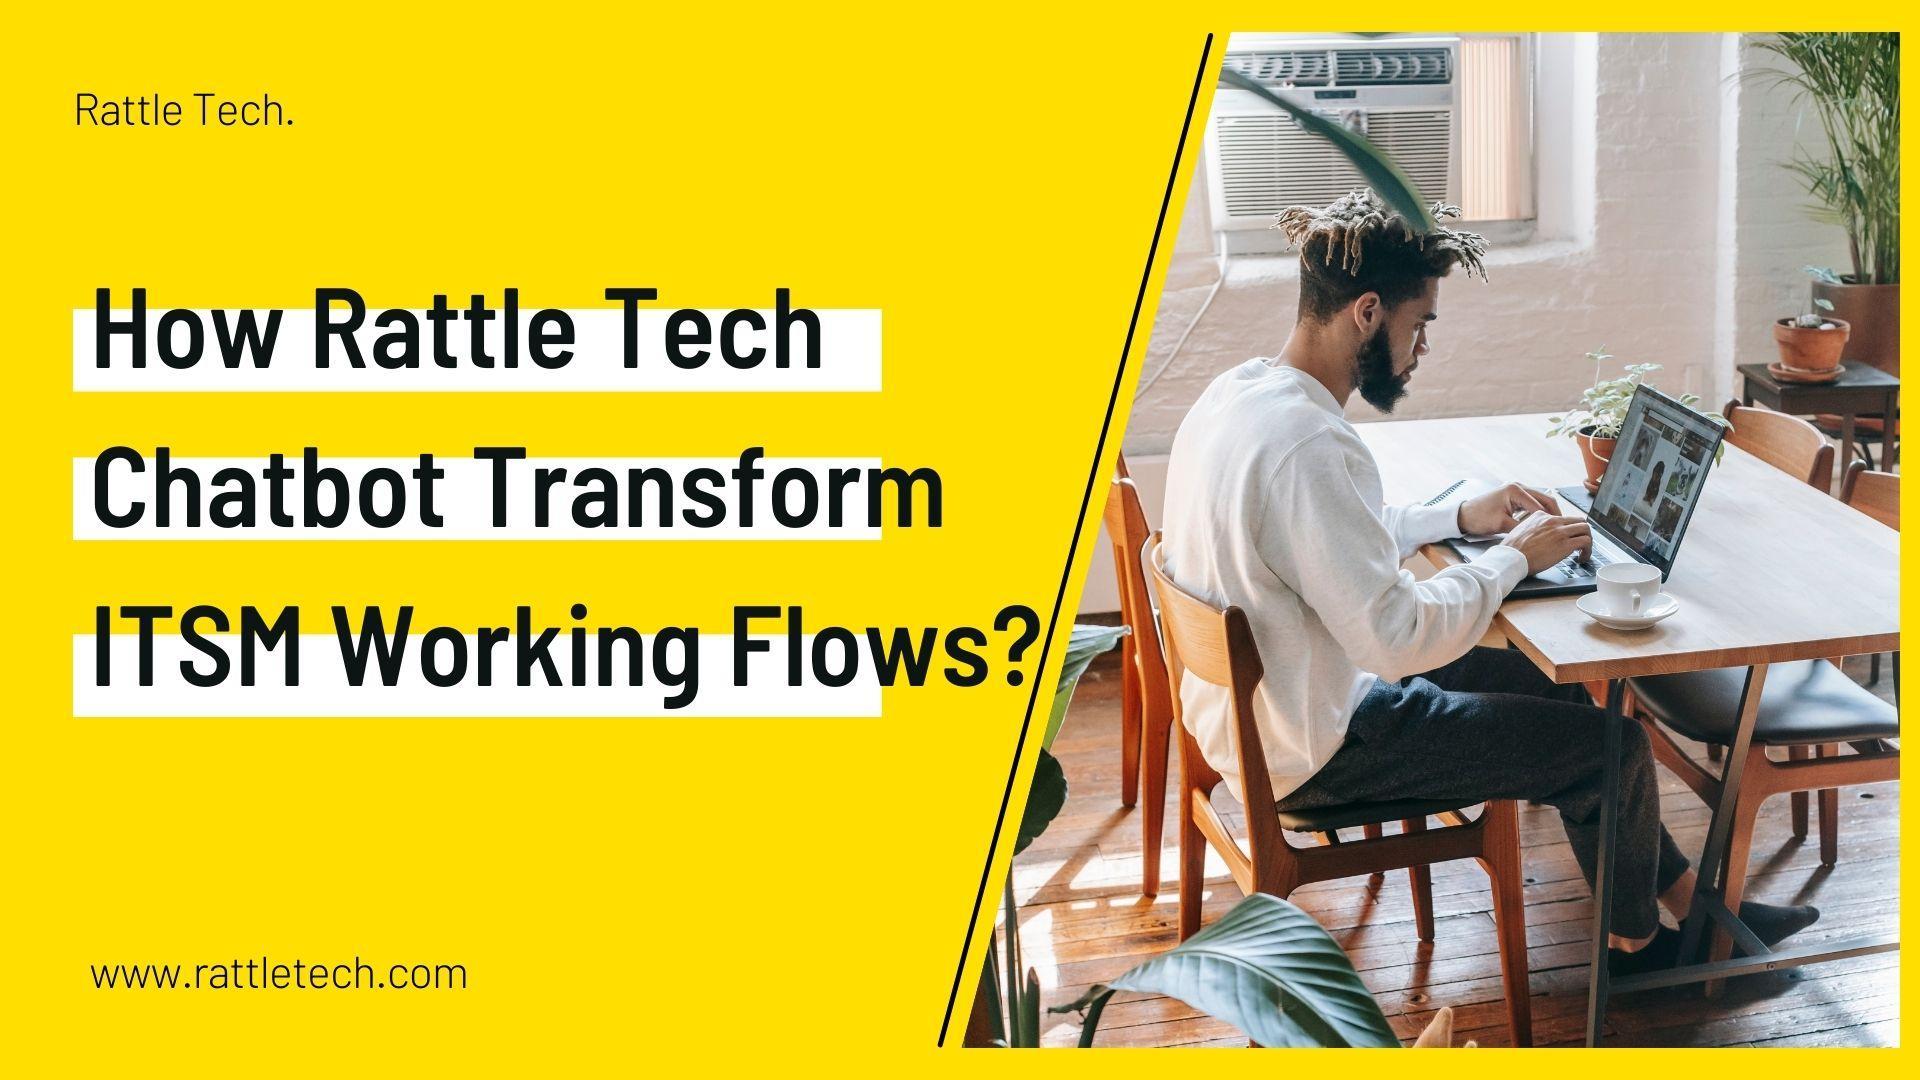 How-Rattle-Tech-Chatbot-Transform-ITSM-Working-Flows